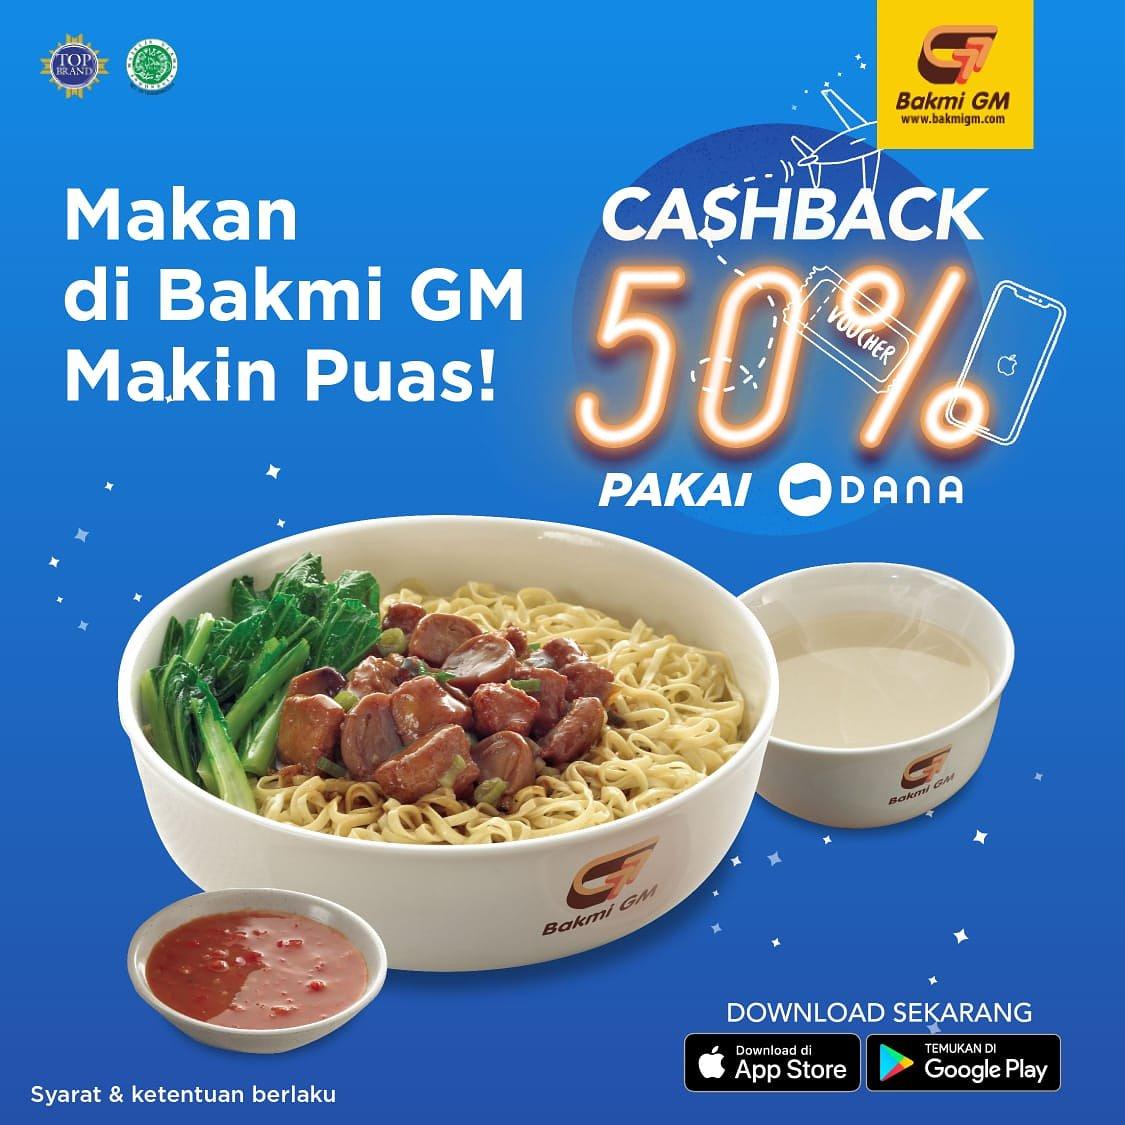 #BakmiGM - #Promo Cashback 50% Makan Puas Pakai Dana (s.d 31 Maret 2019)